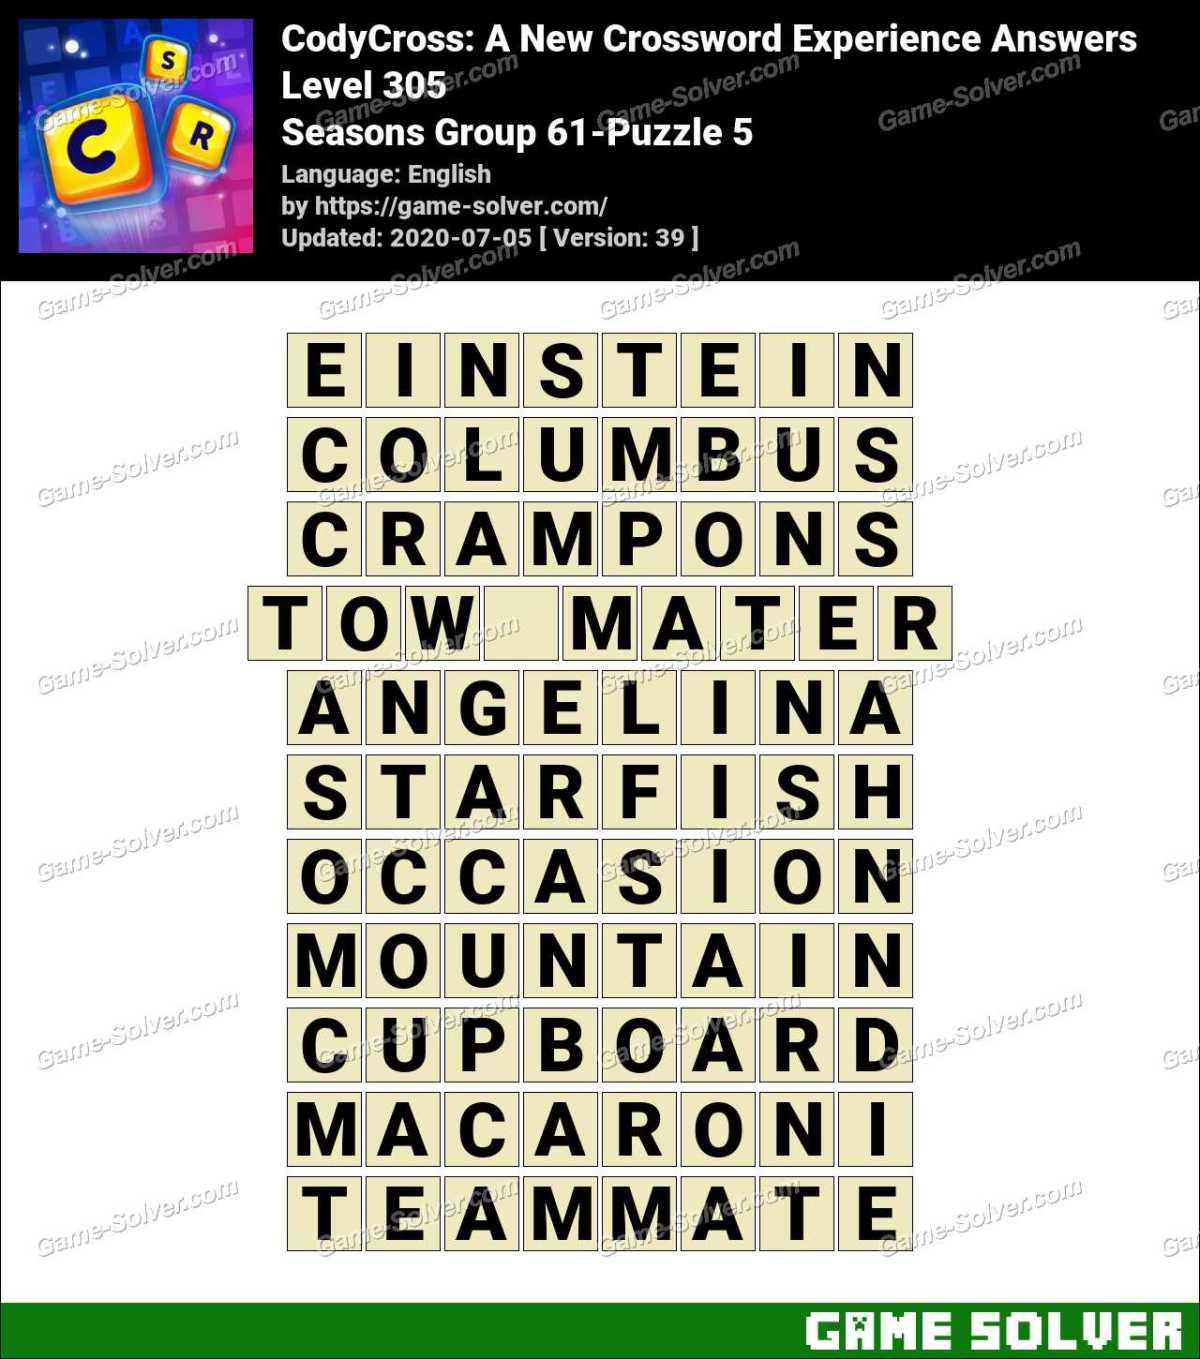 CodyCross Seasons Group 61-Puzzle 5 Answers